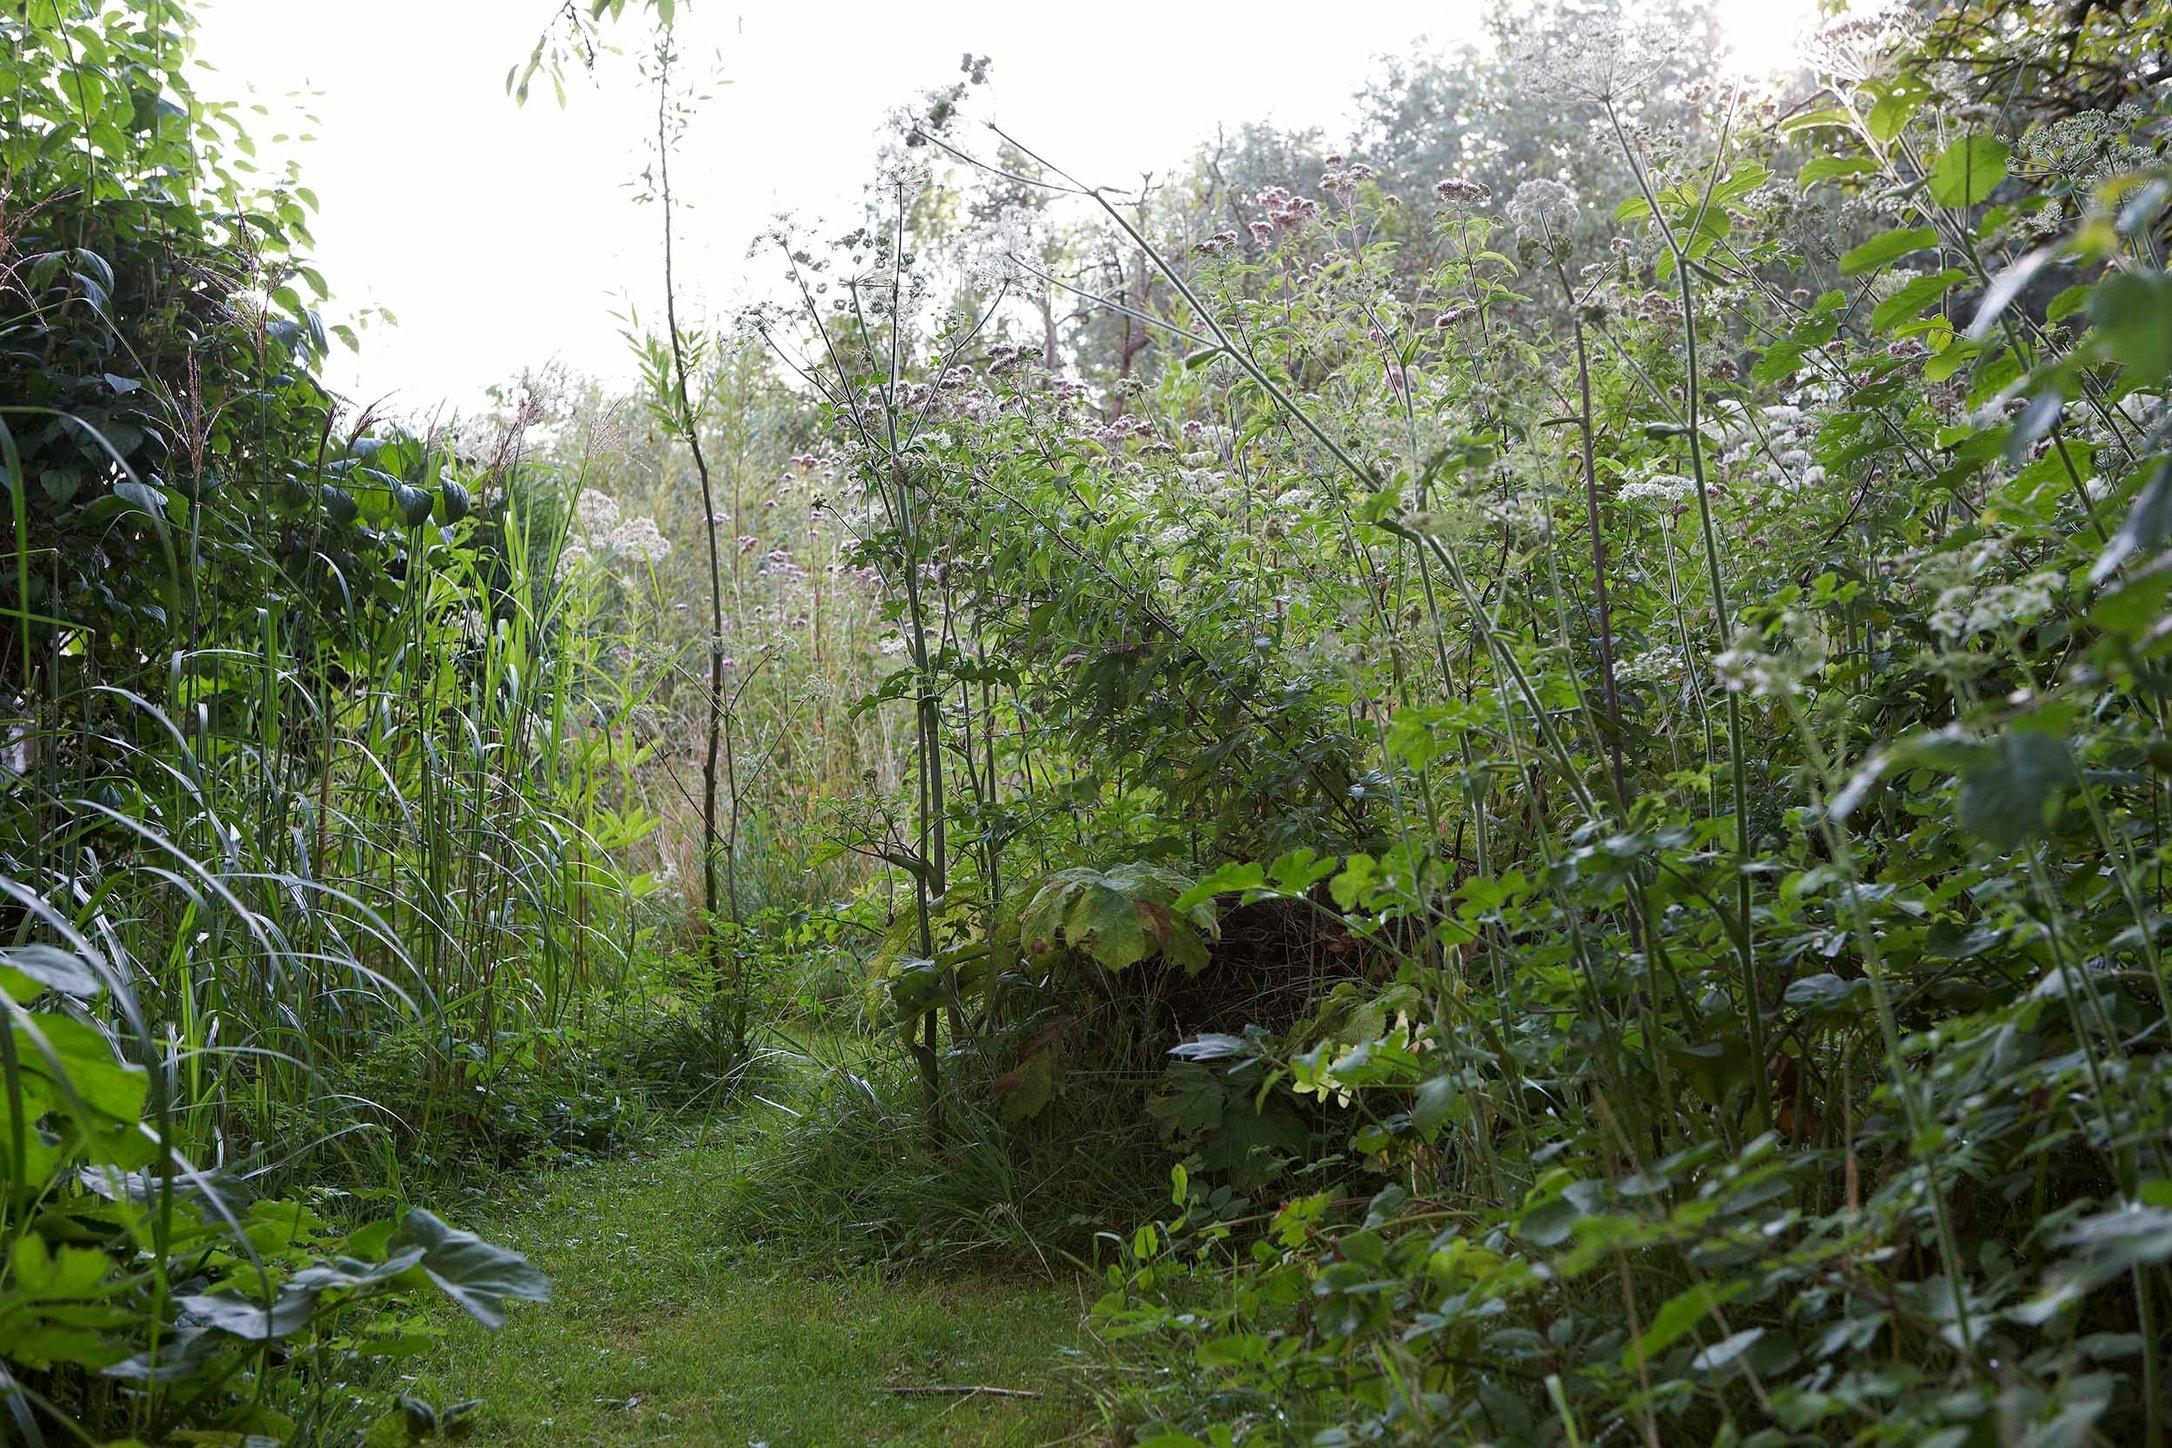 11A-Jardin gilles- 49 1.jpg